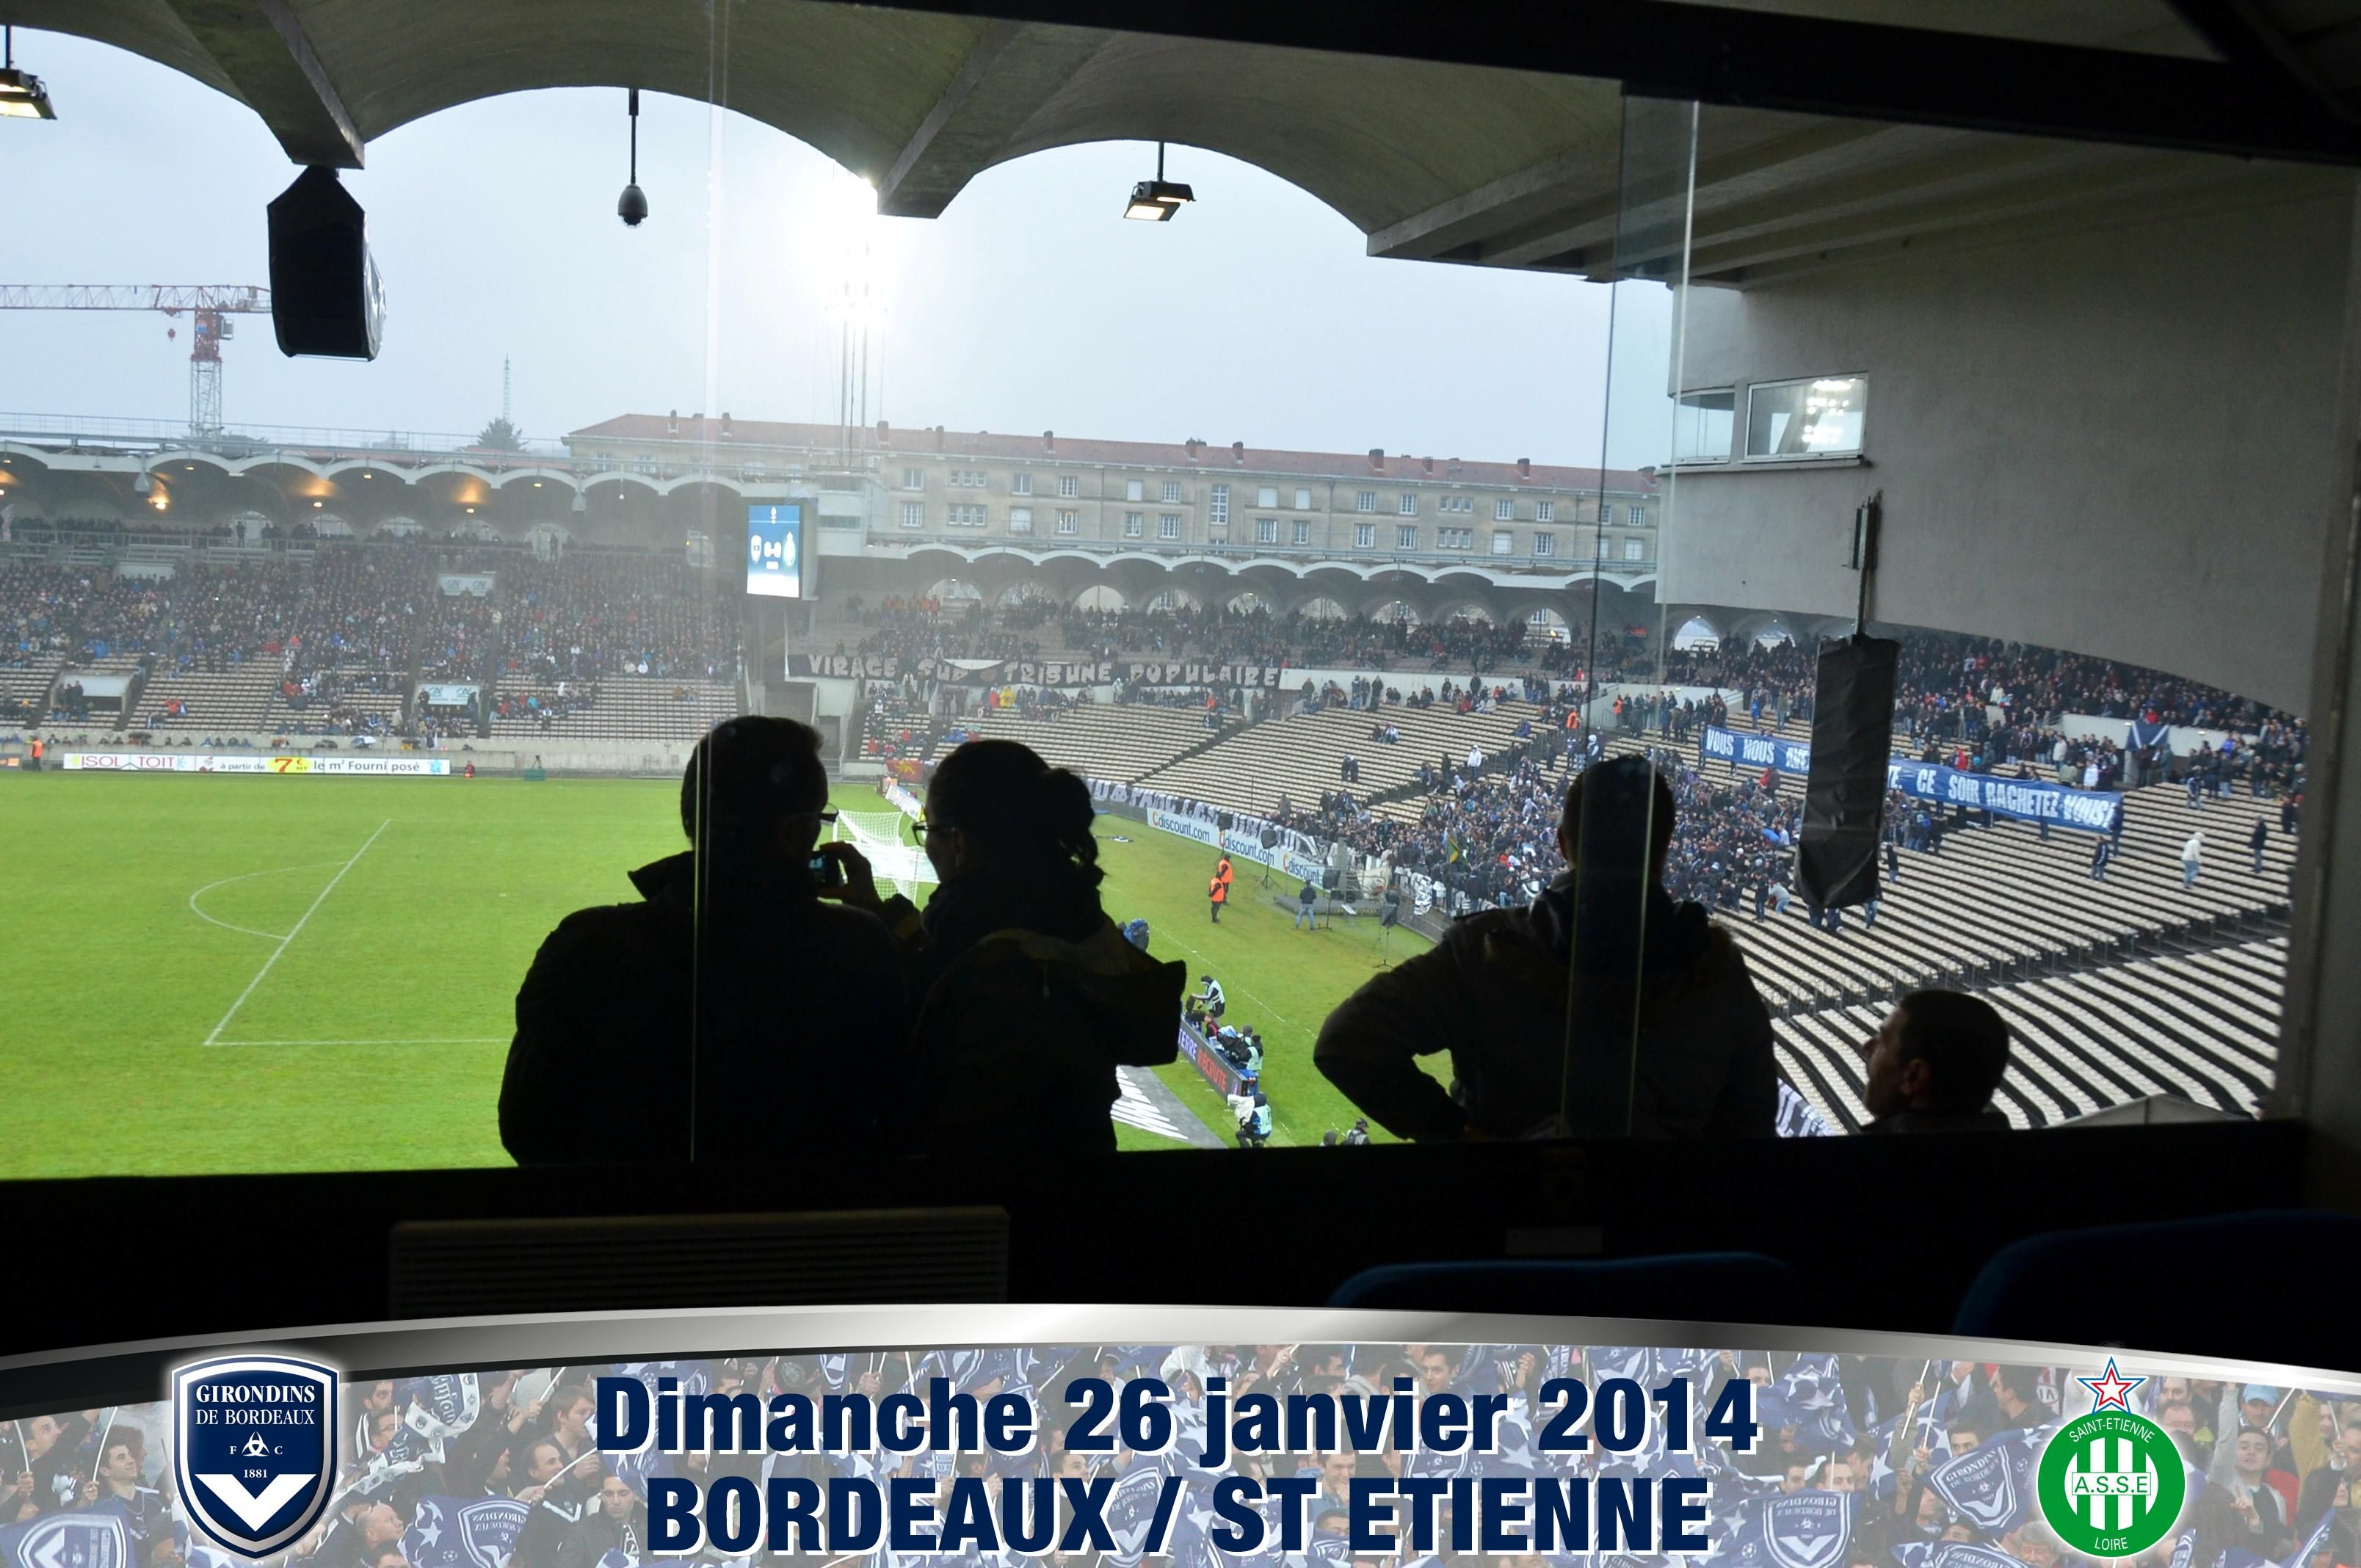 Girondins de Bordeaux - ASSE - 26/01/2014